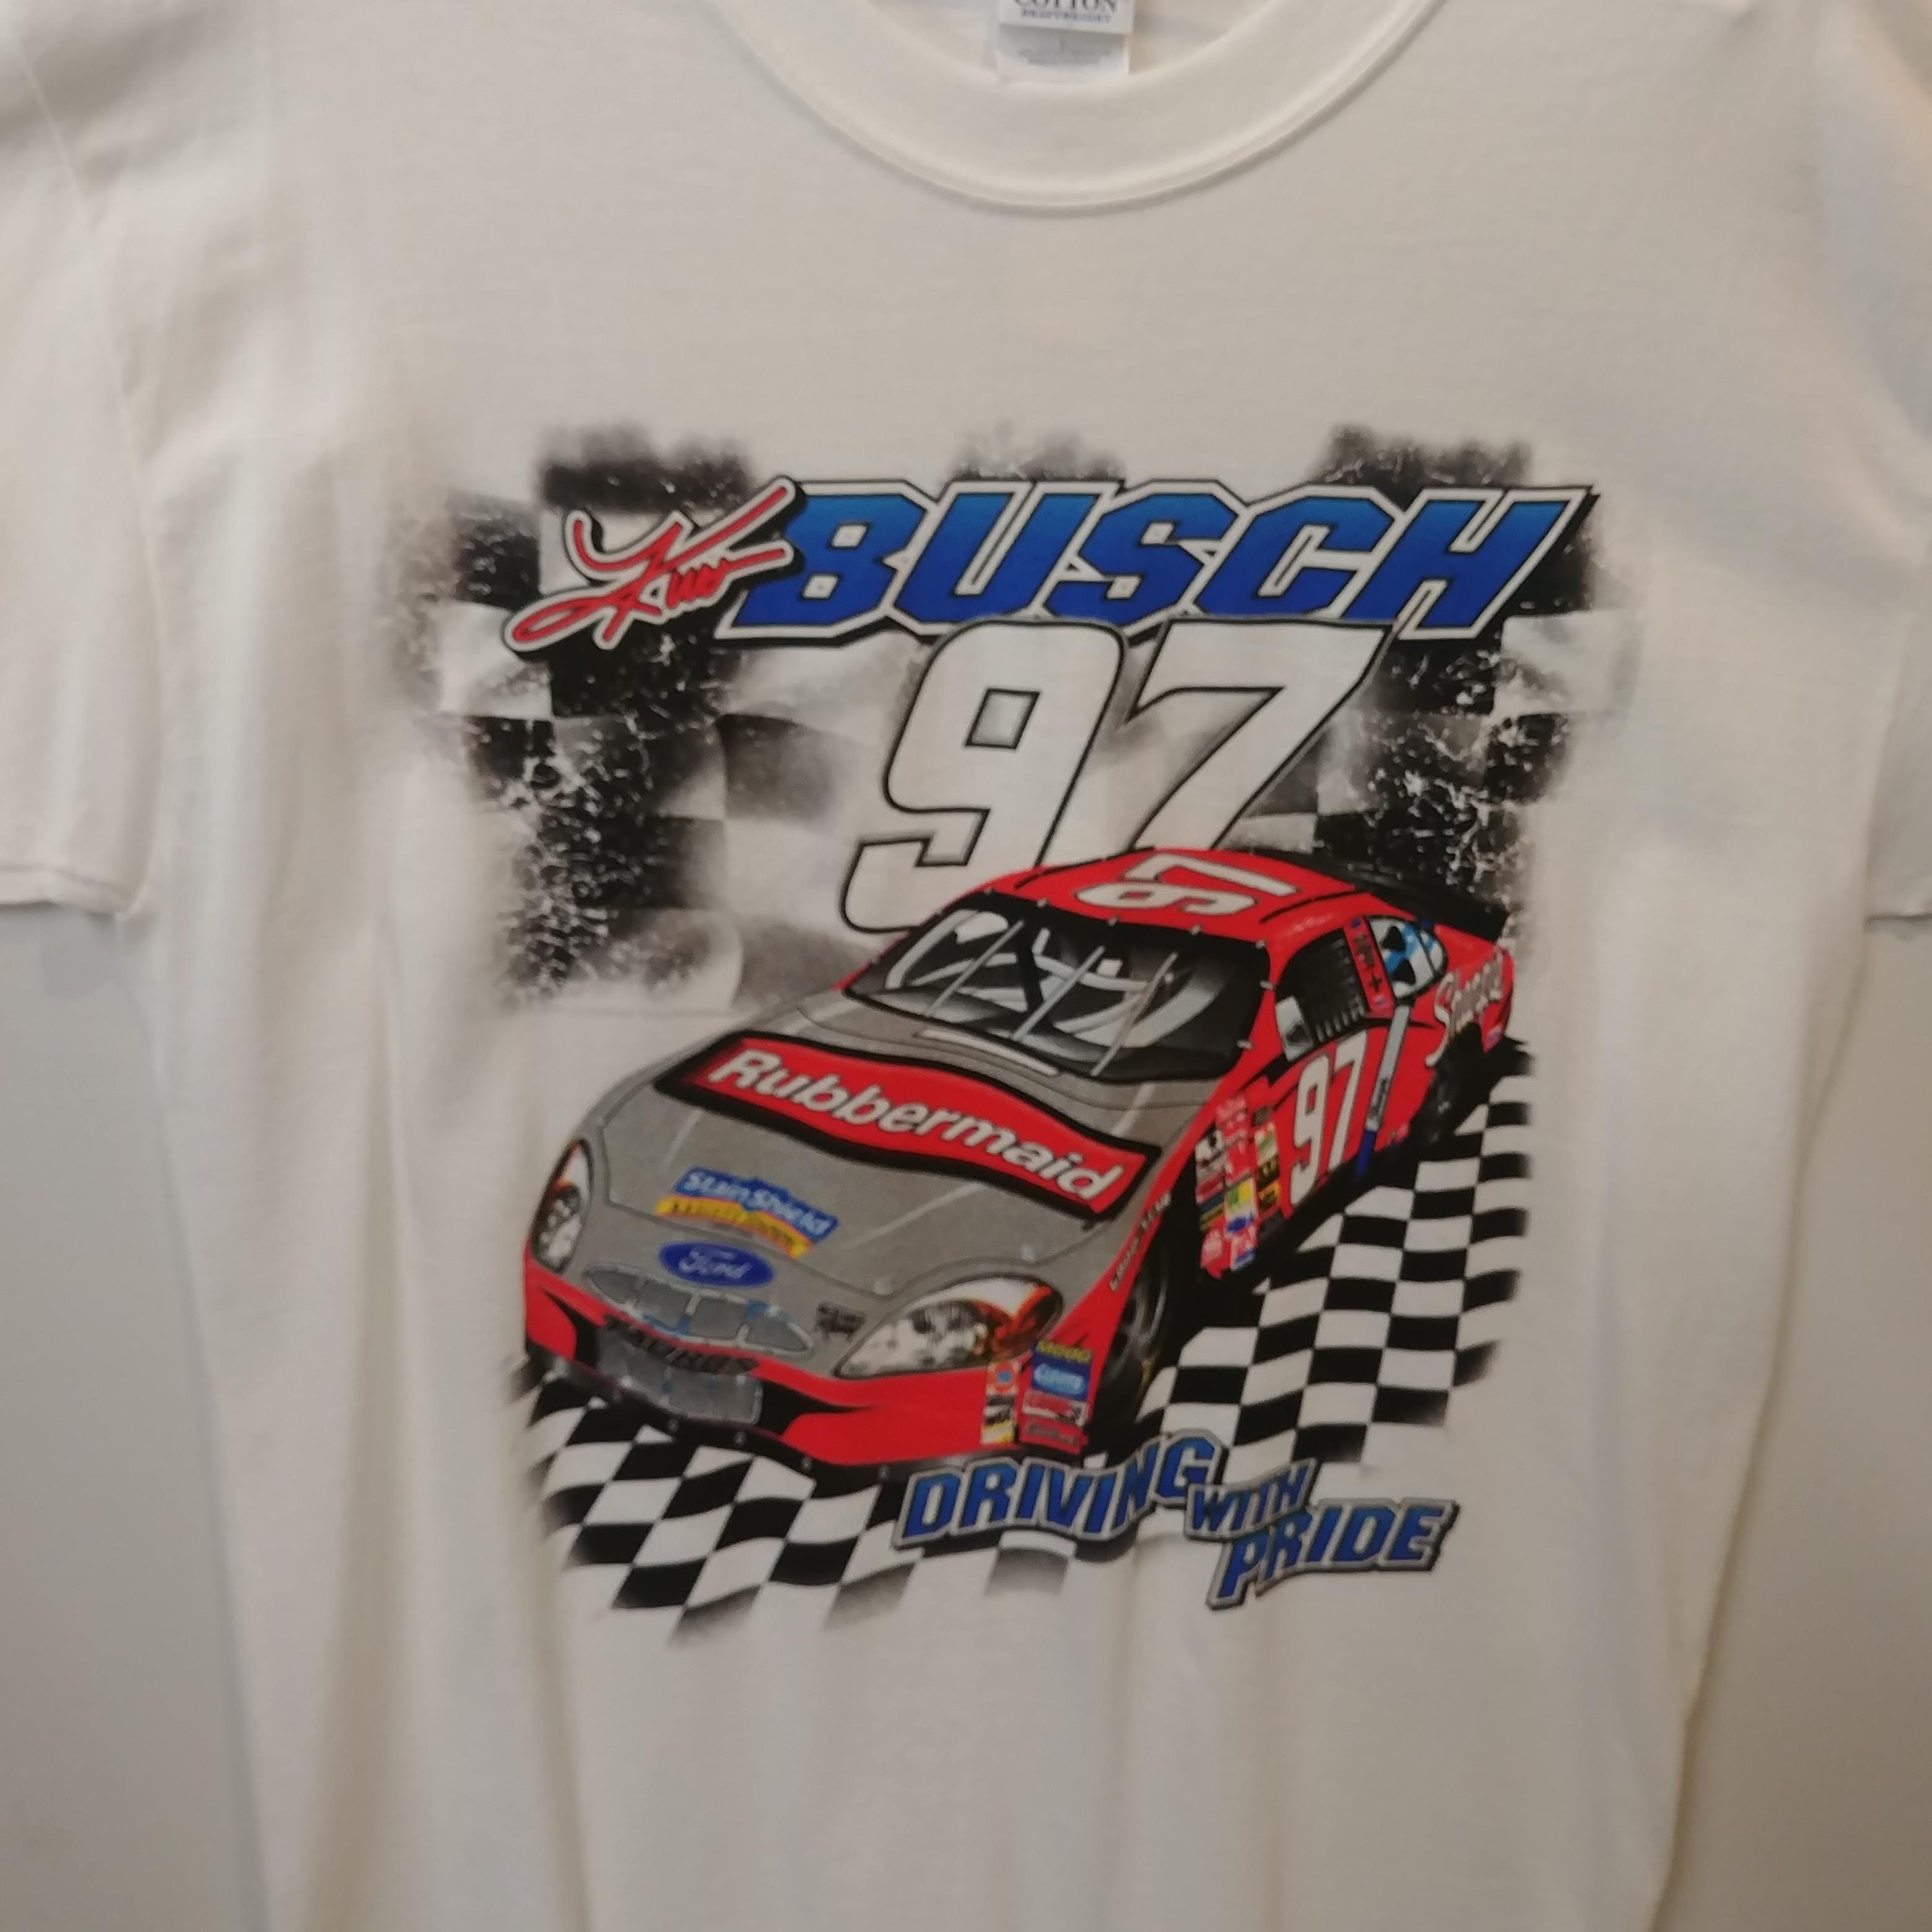 "2003 Kurt Busch Rubbermaid/Sharpie ""Driven with Pride"" tee"